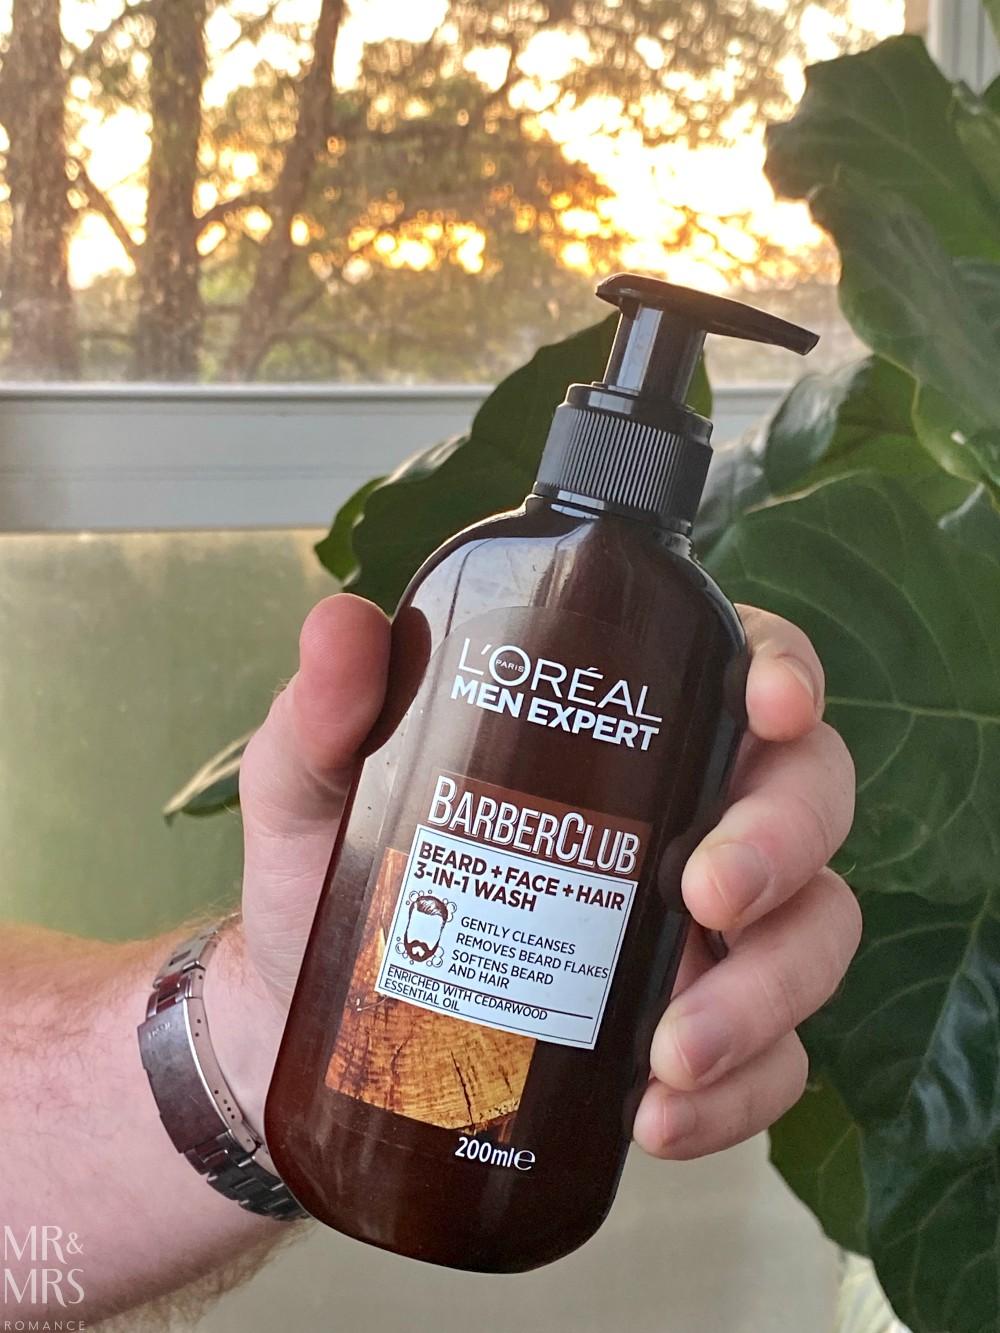 L'Oreal Men Expert BarberClub face wash